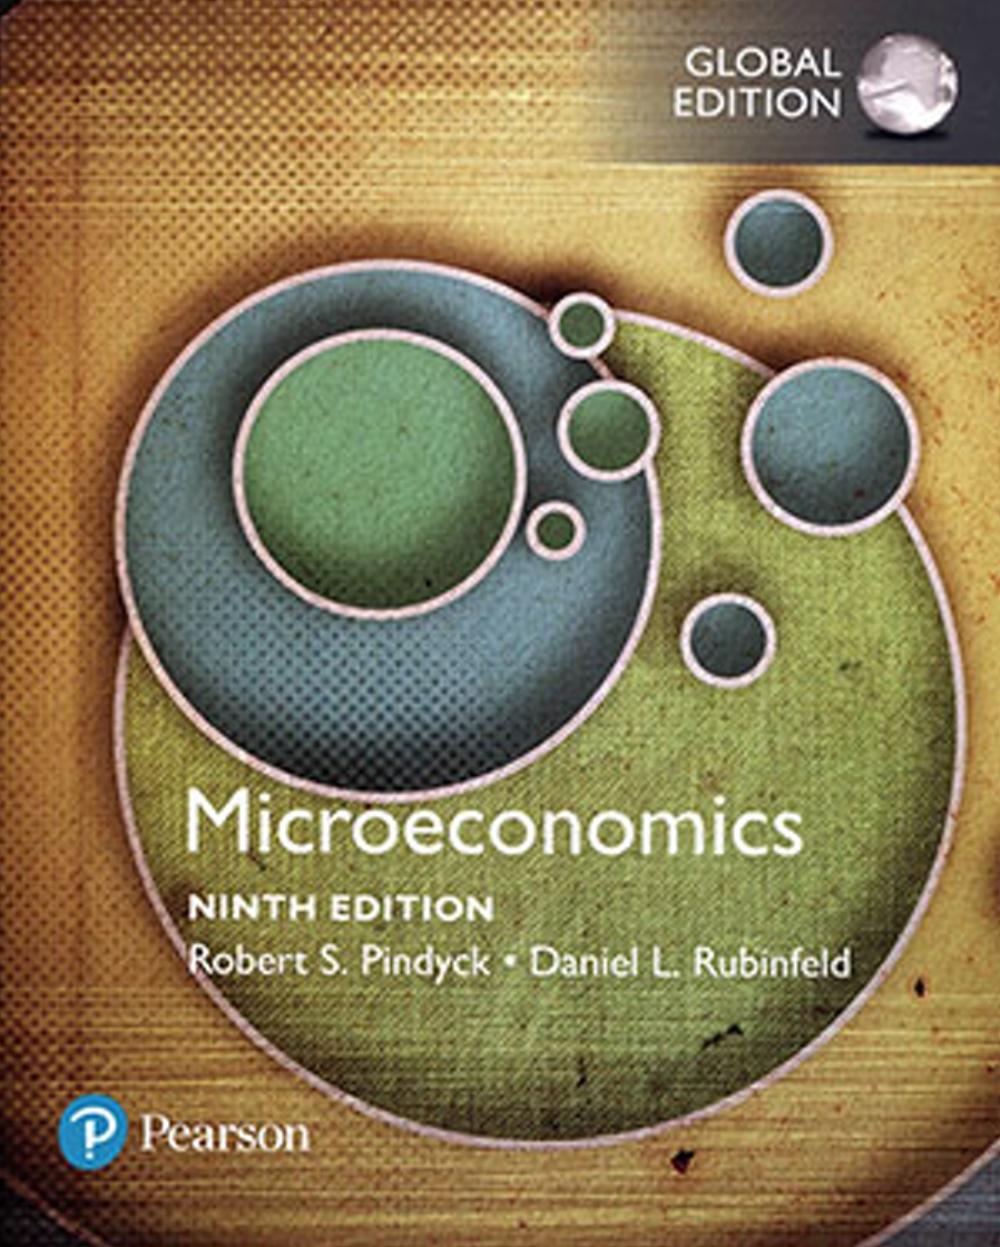 Microeconomics (GE) 9e